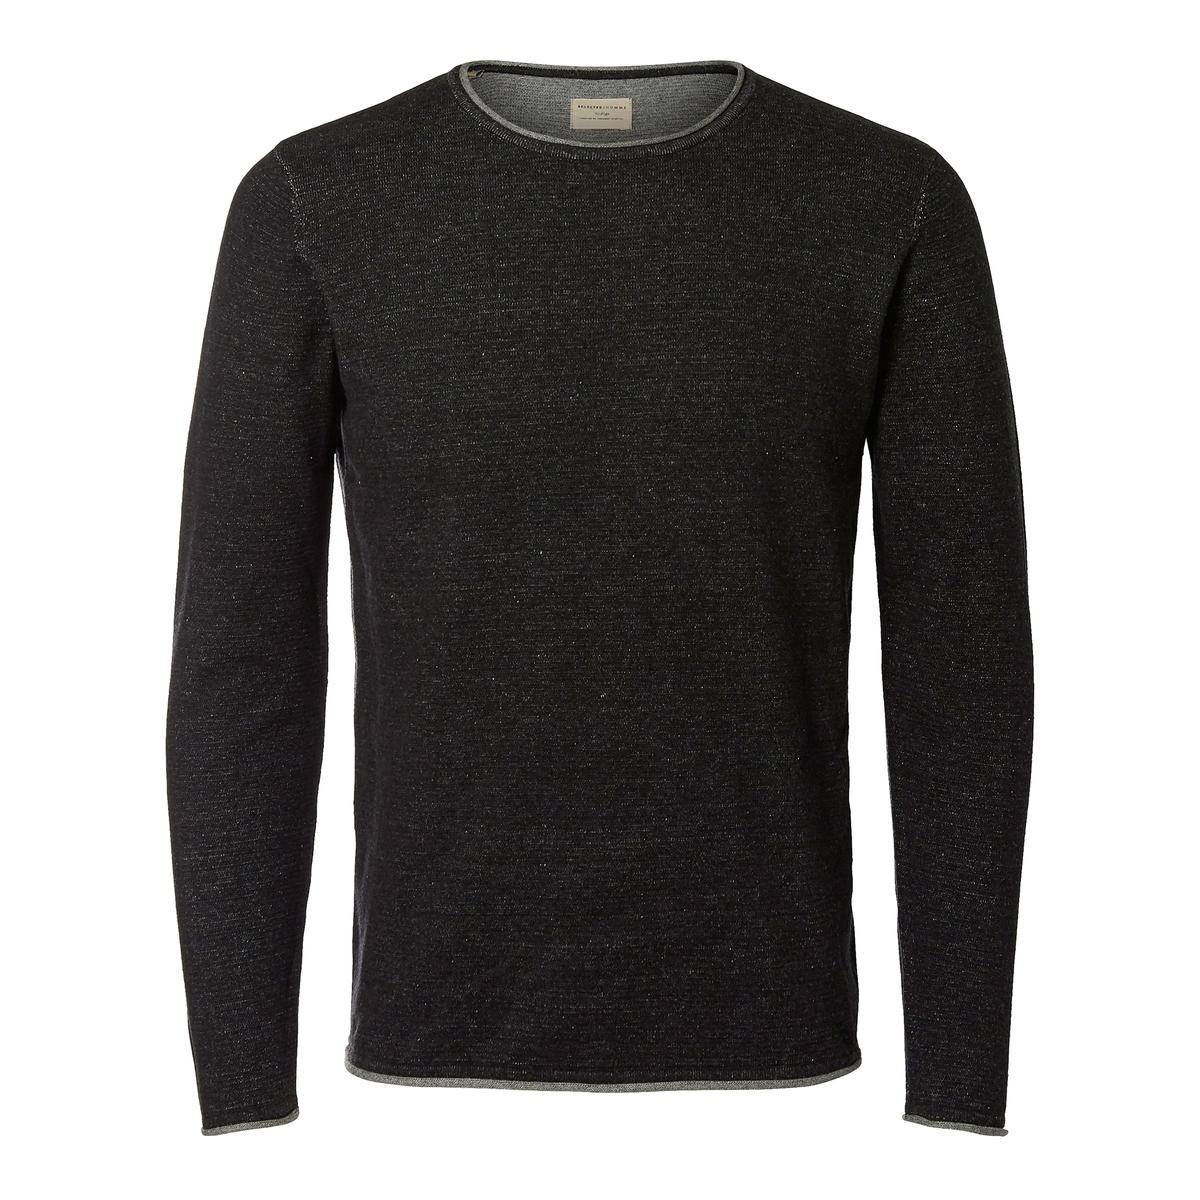 Пуловер  KLOP из хлопка меланж